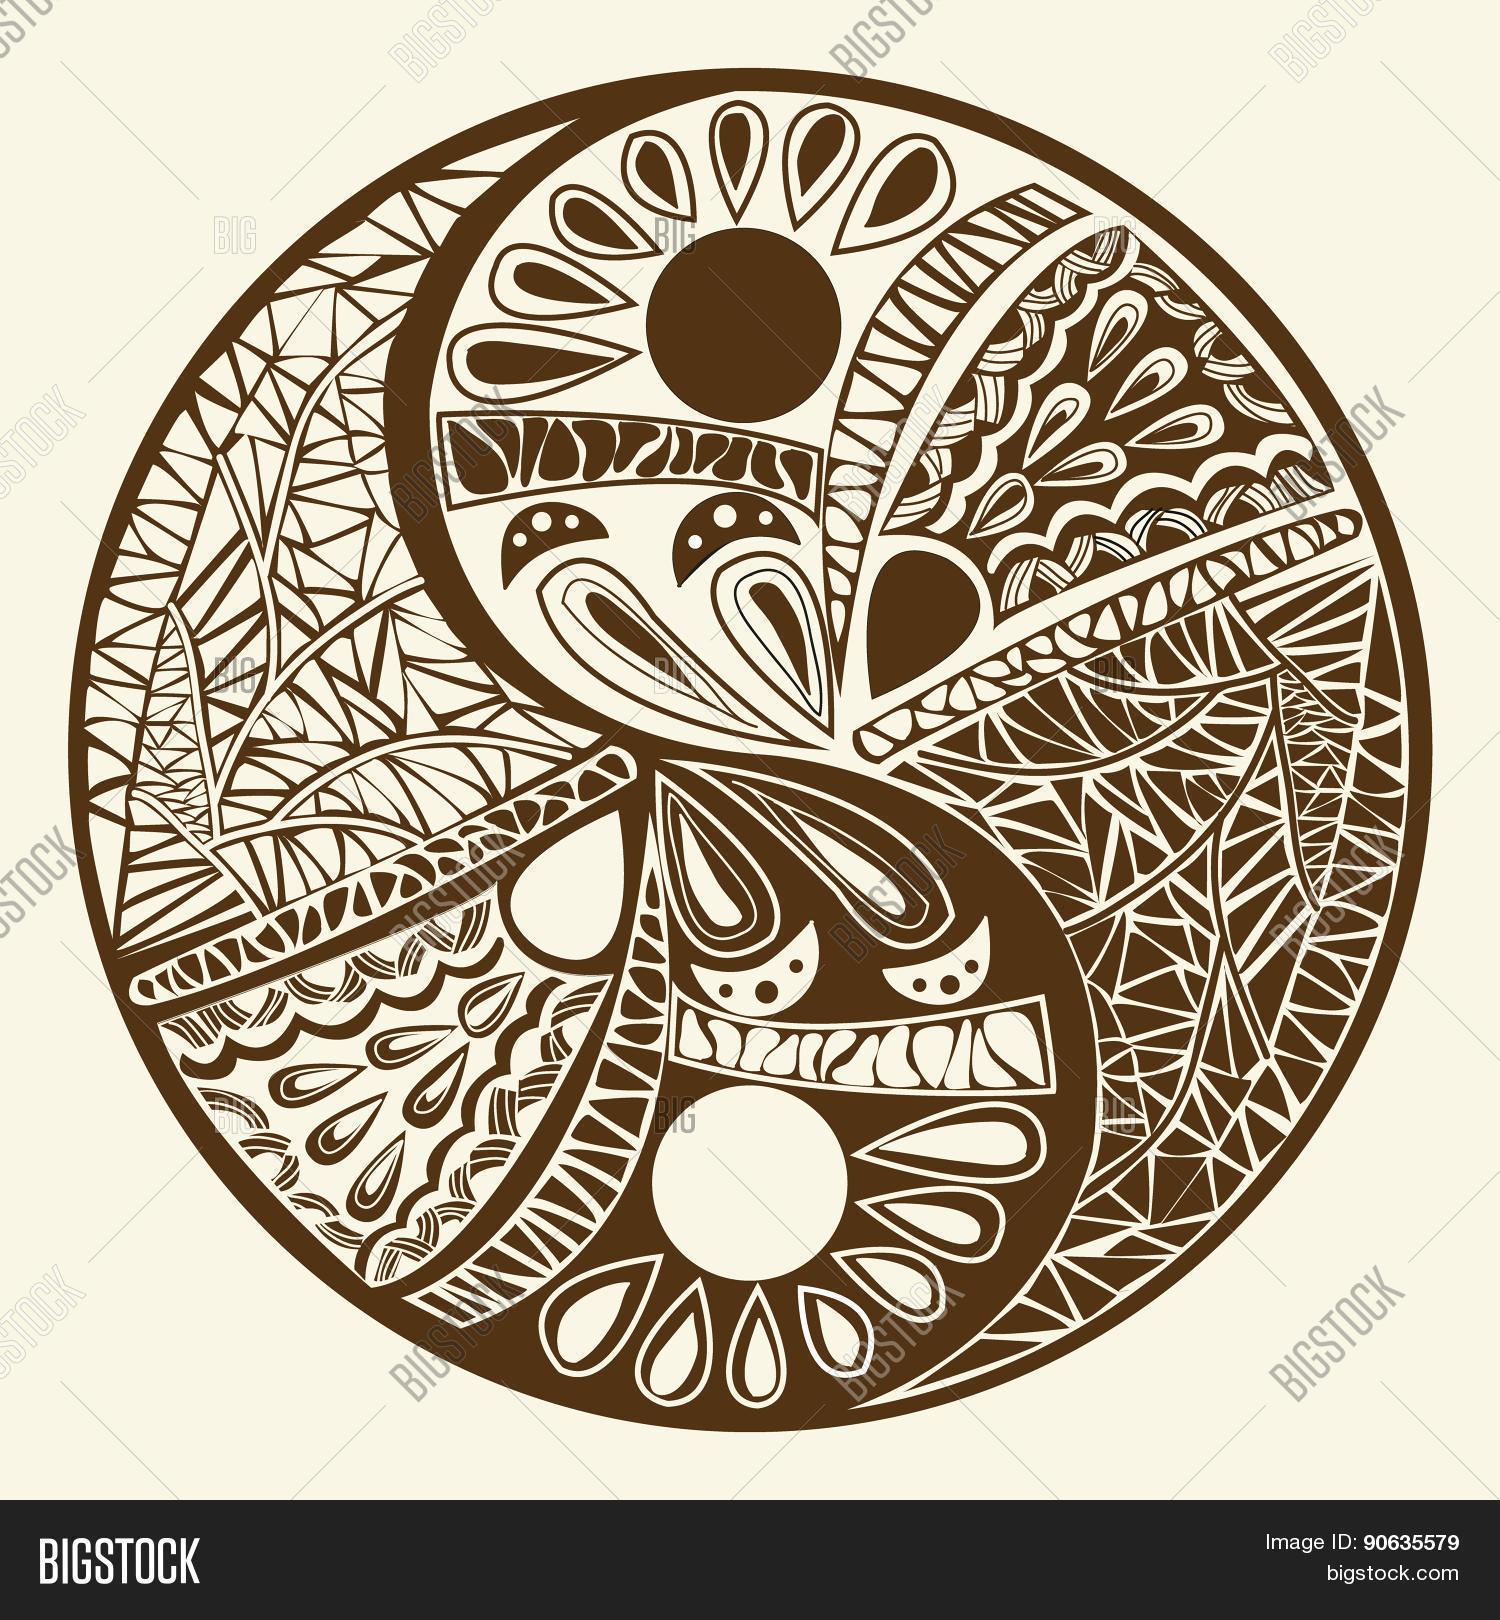 Yin yang symbol asian decoration vector photo bigstock for Decoration murale yin yang